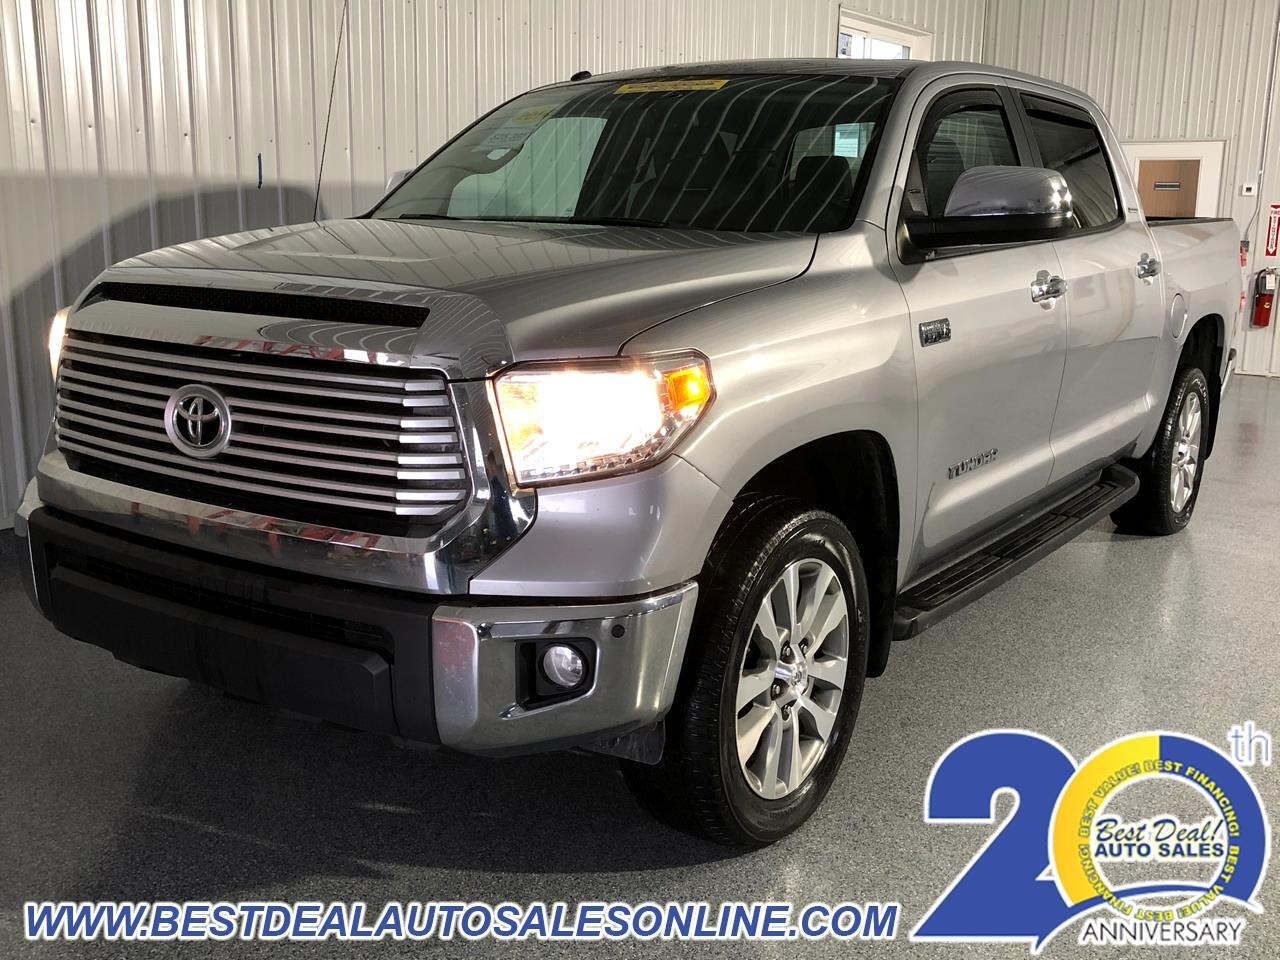 2014 Toyota Tundra Limited V8